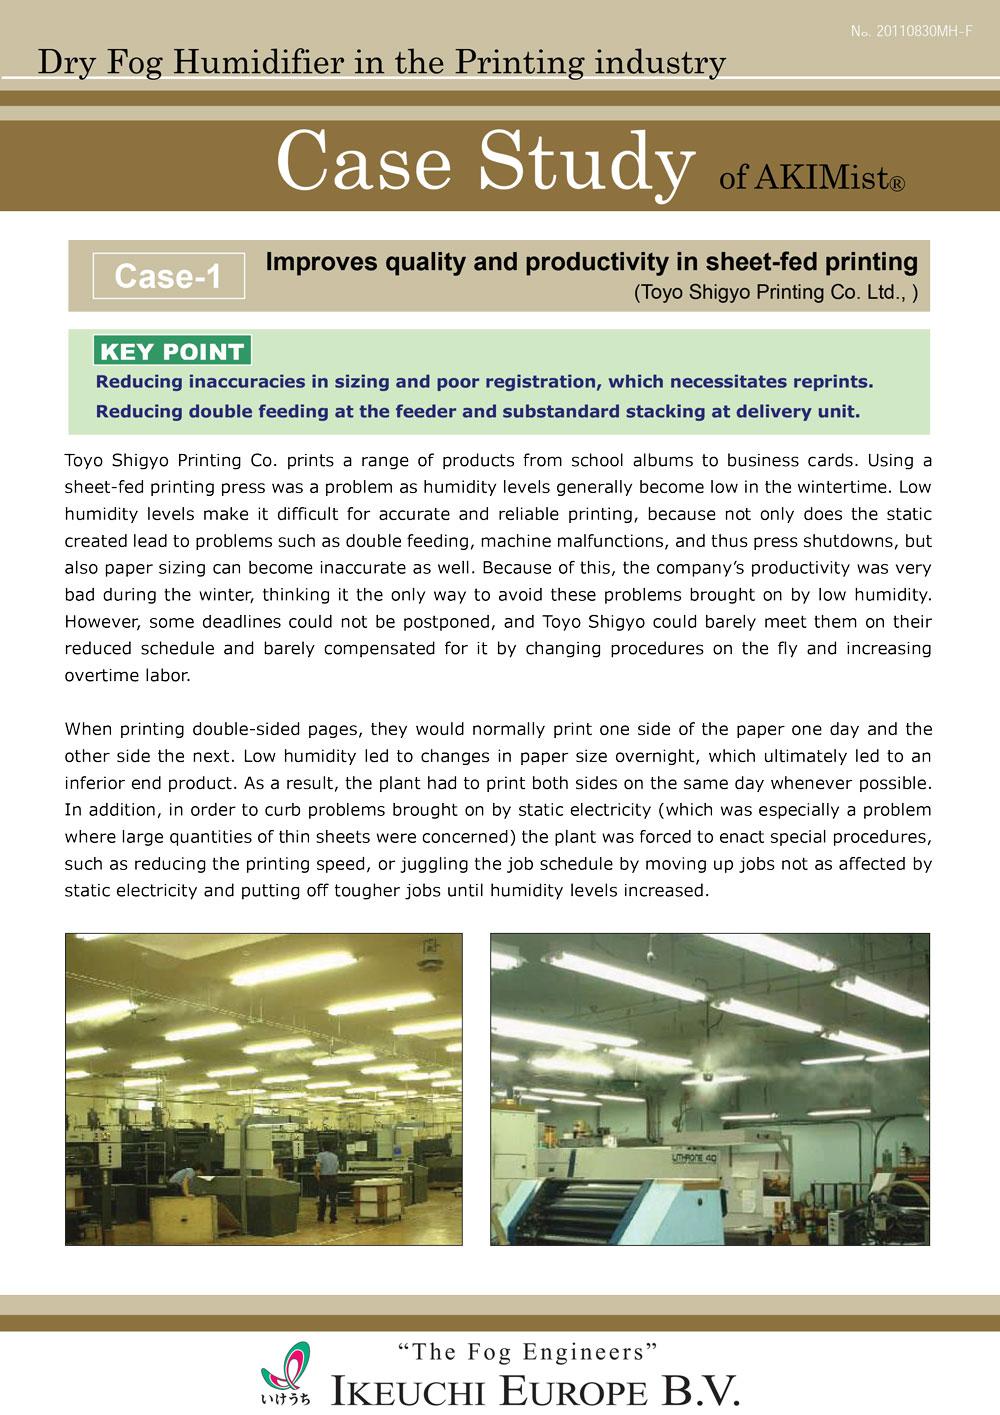 humidification-printing-industry